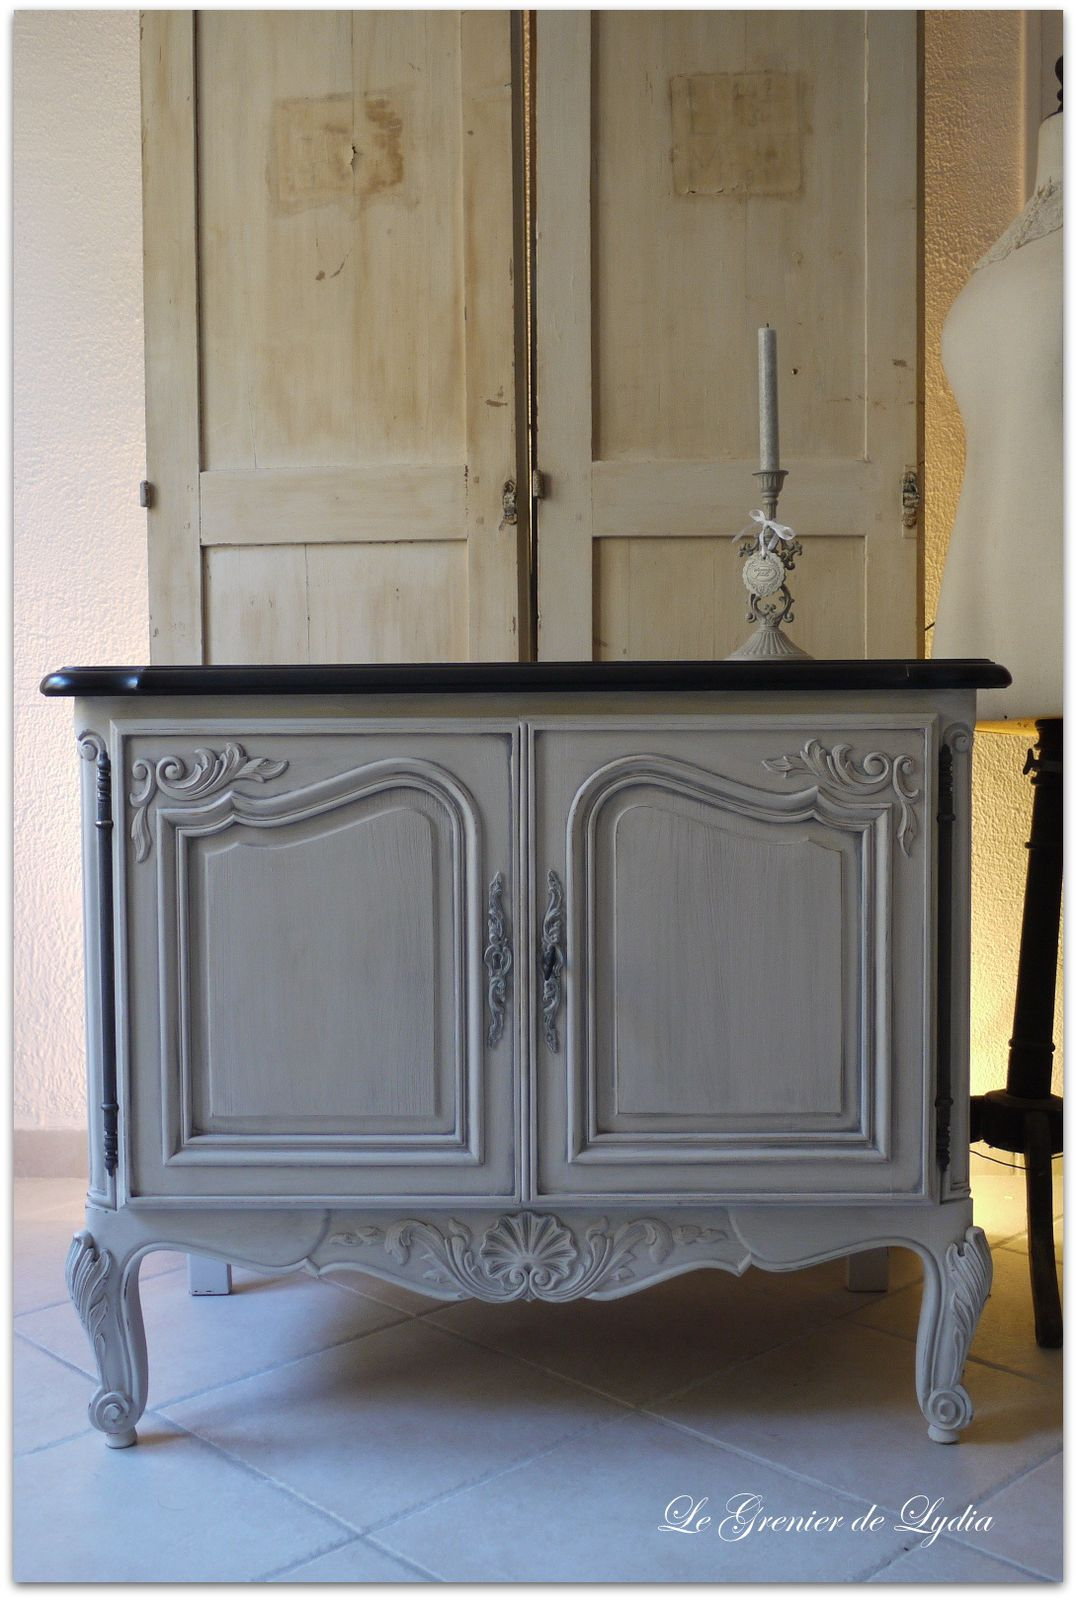 petit buffet r gence patin relooking de meubles meubles patin s d coration patine. Black Bedroom Furniture Sets. Home Design Ideas